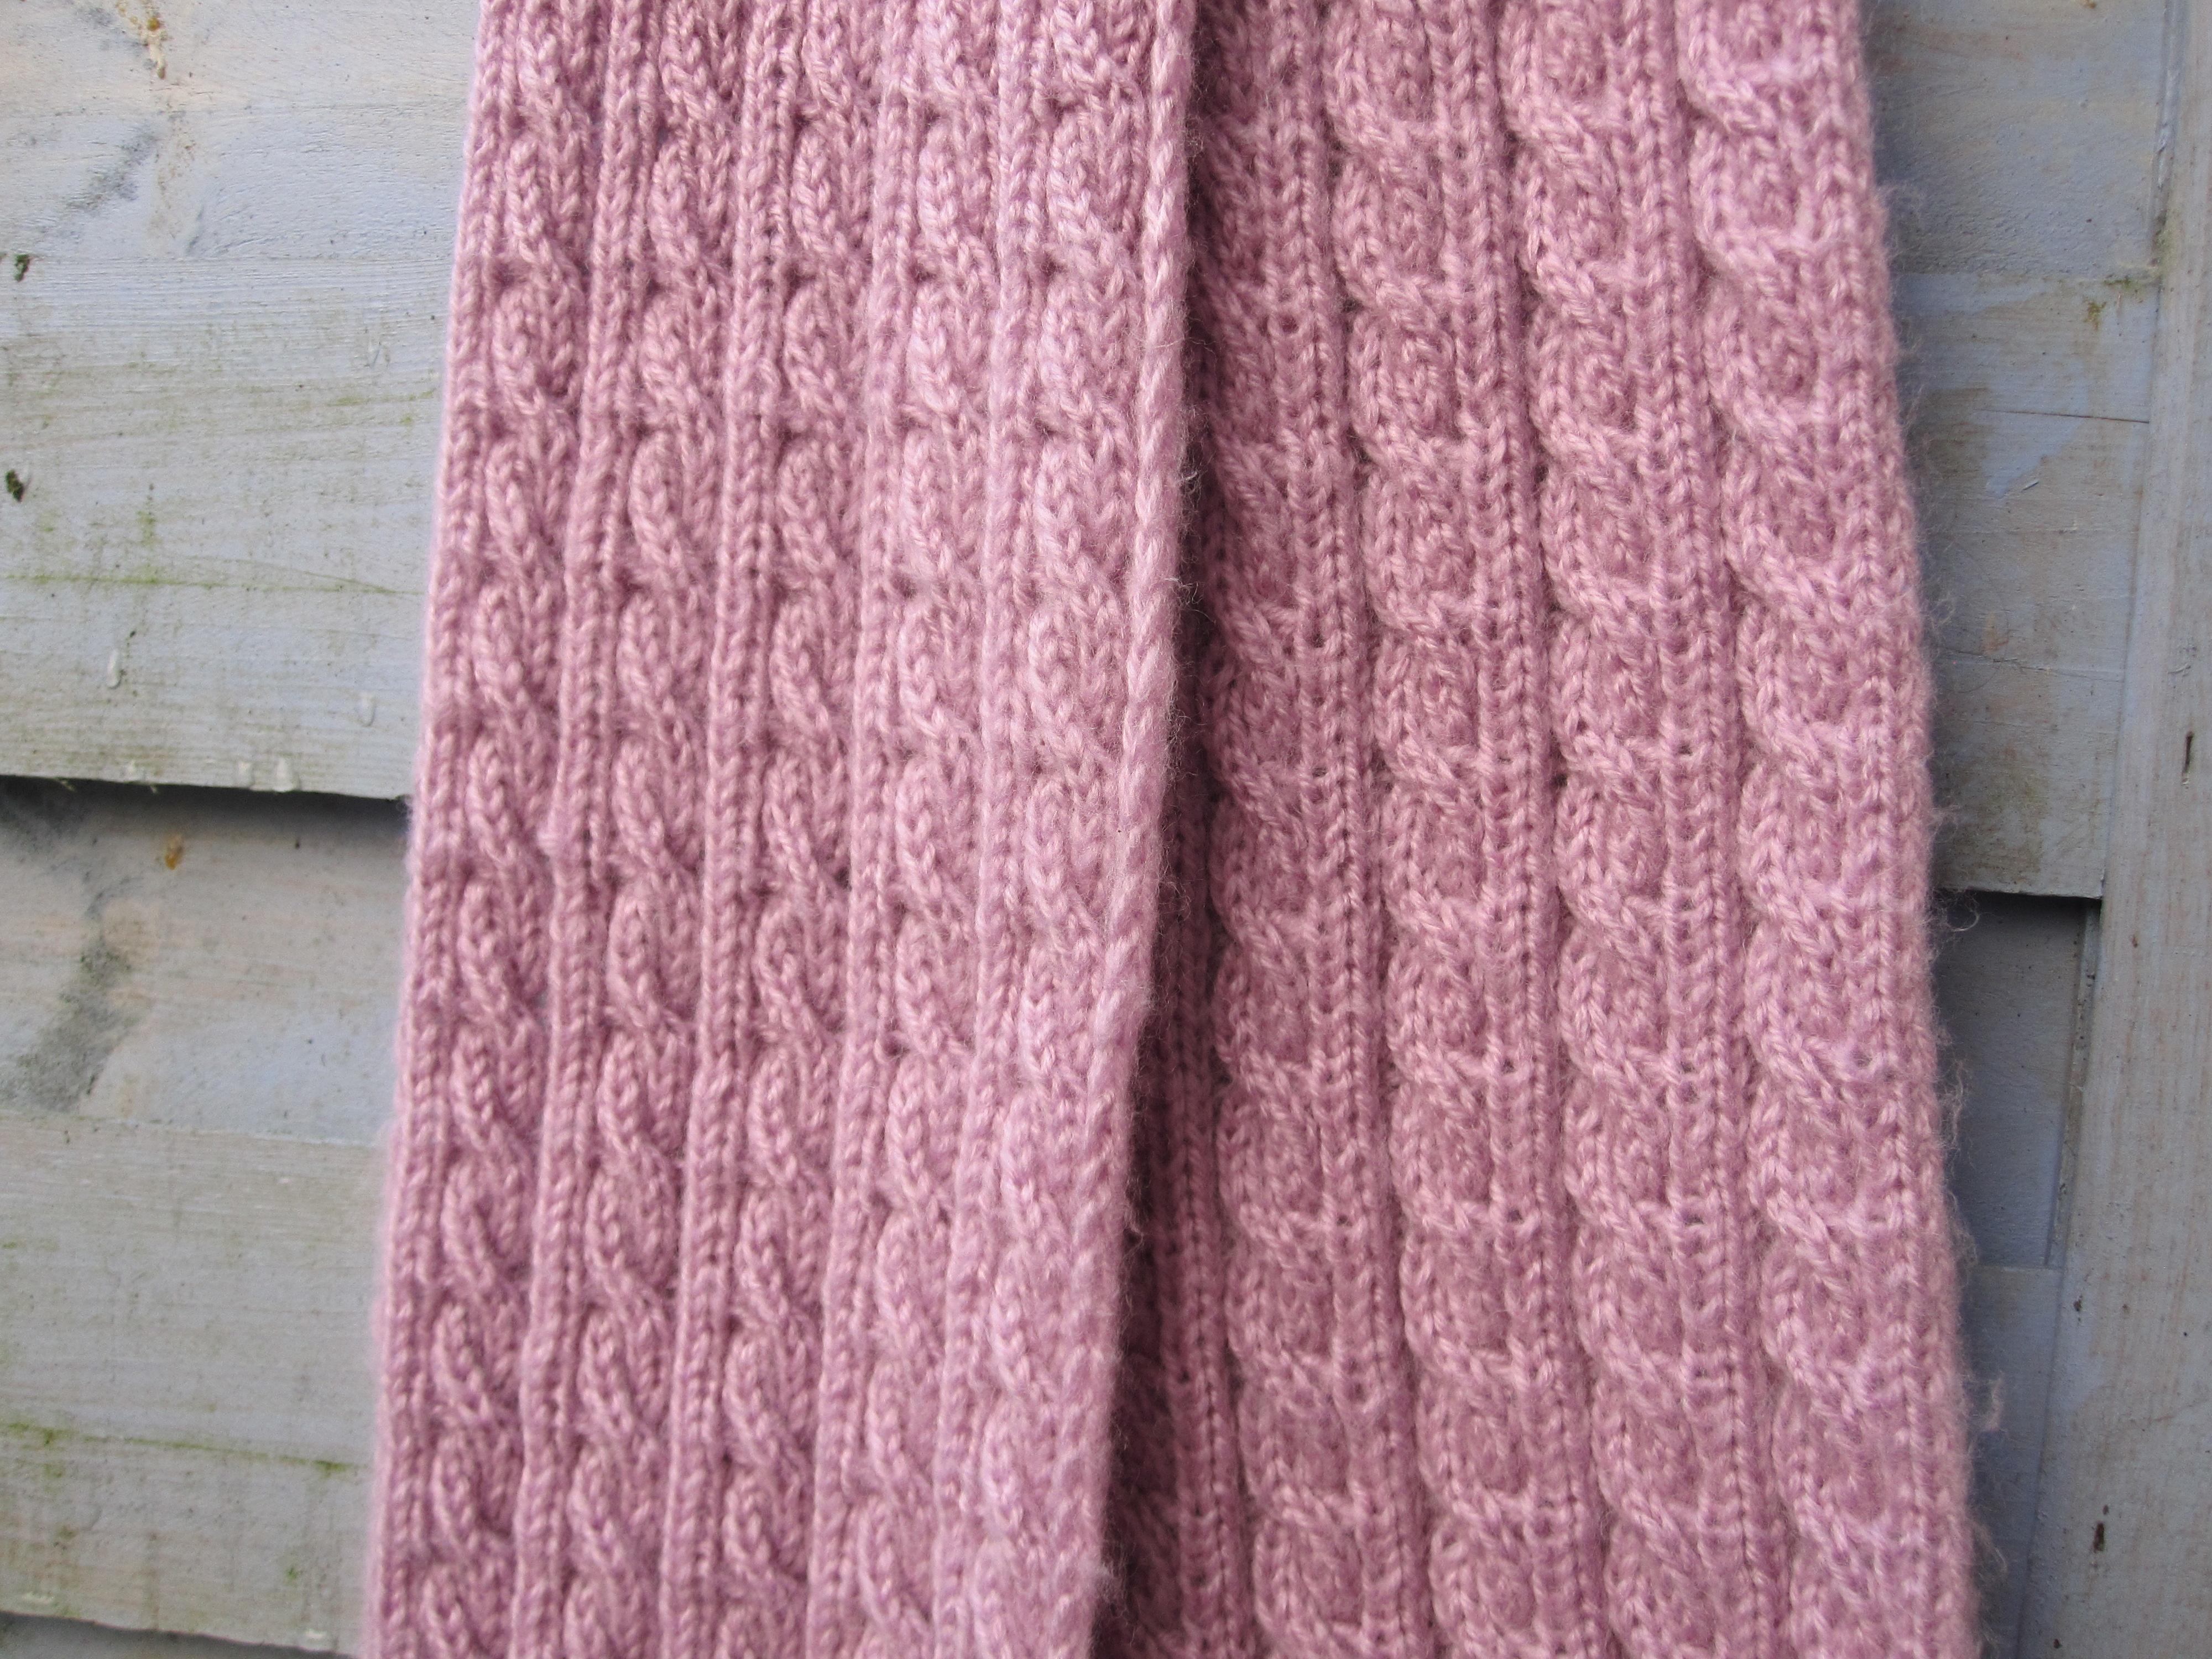 5e84da6360f4 Écharpe à torsades tricotée main – L Atelier de Tina